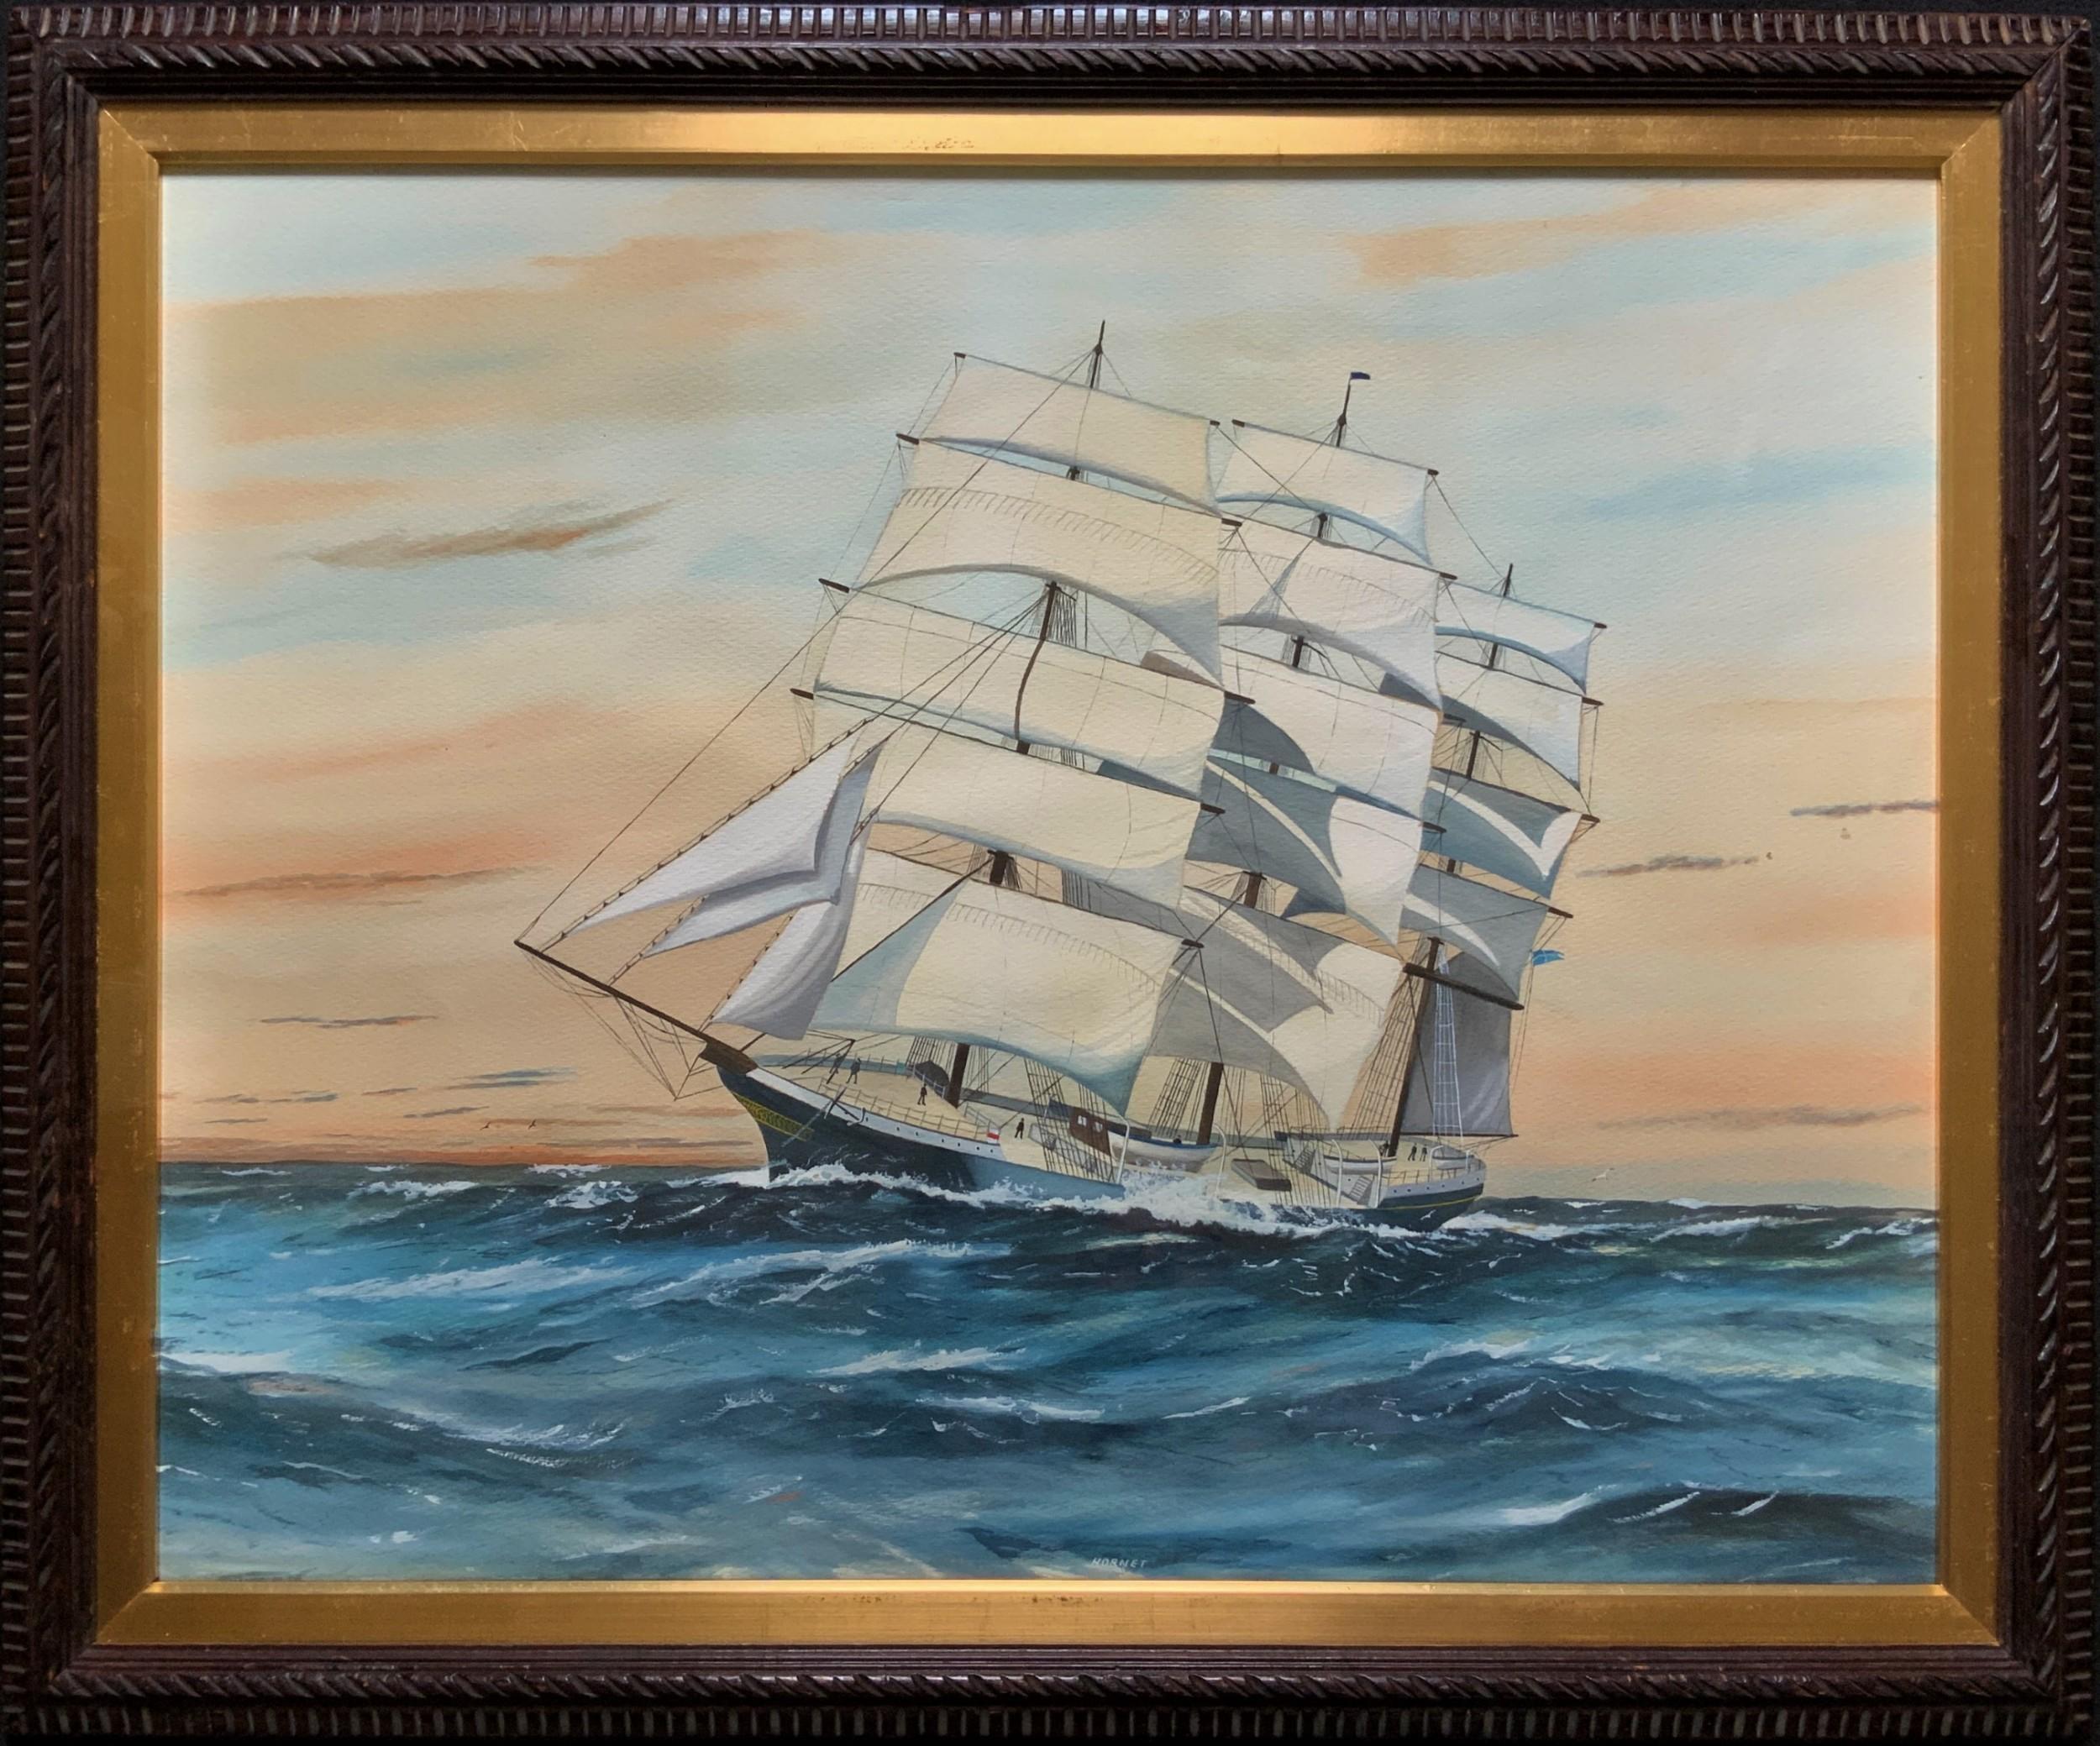 awesome c1909 tea clipper ship 'hornet' rough seas seascape watercolour painting